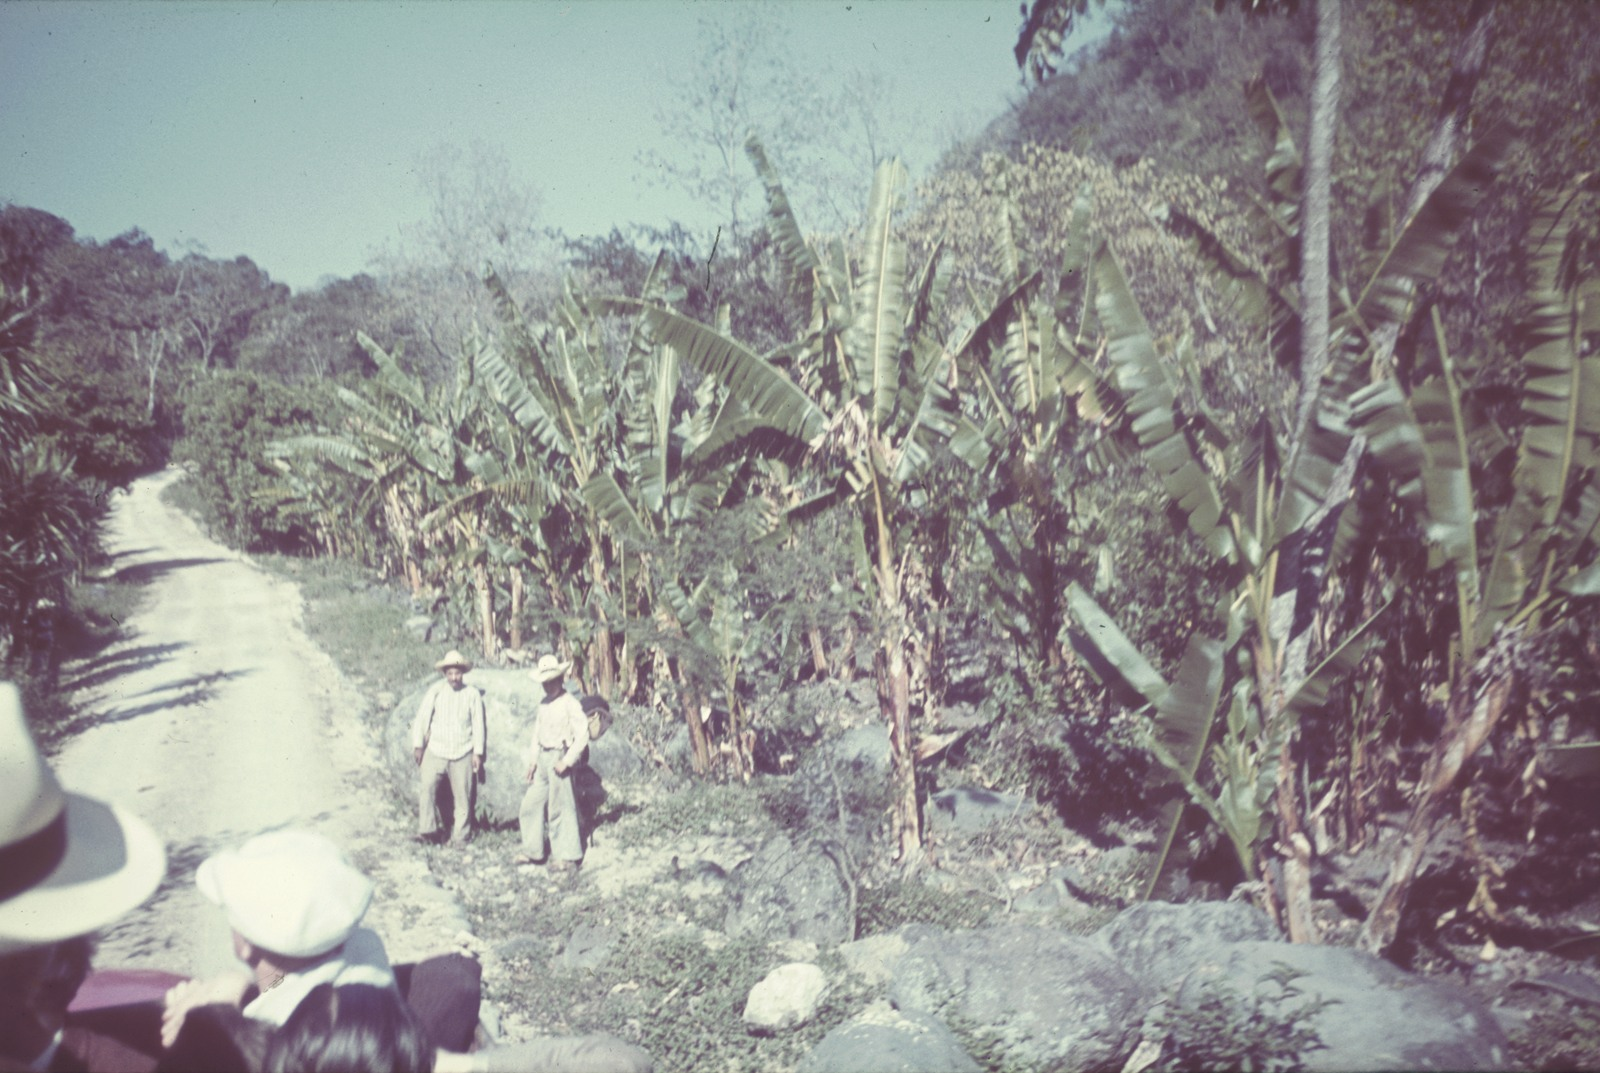 Мексика. Грунтовая дорога